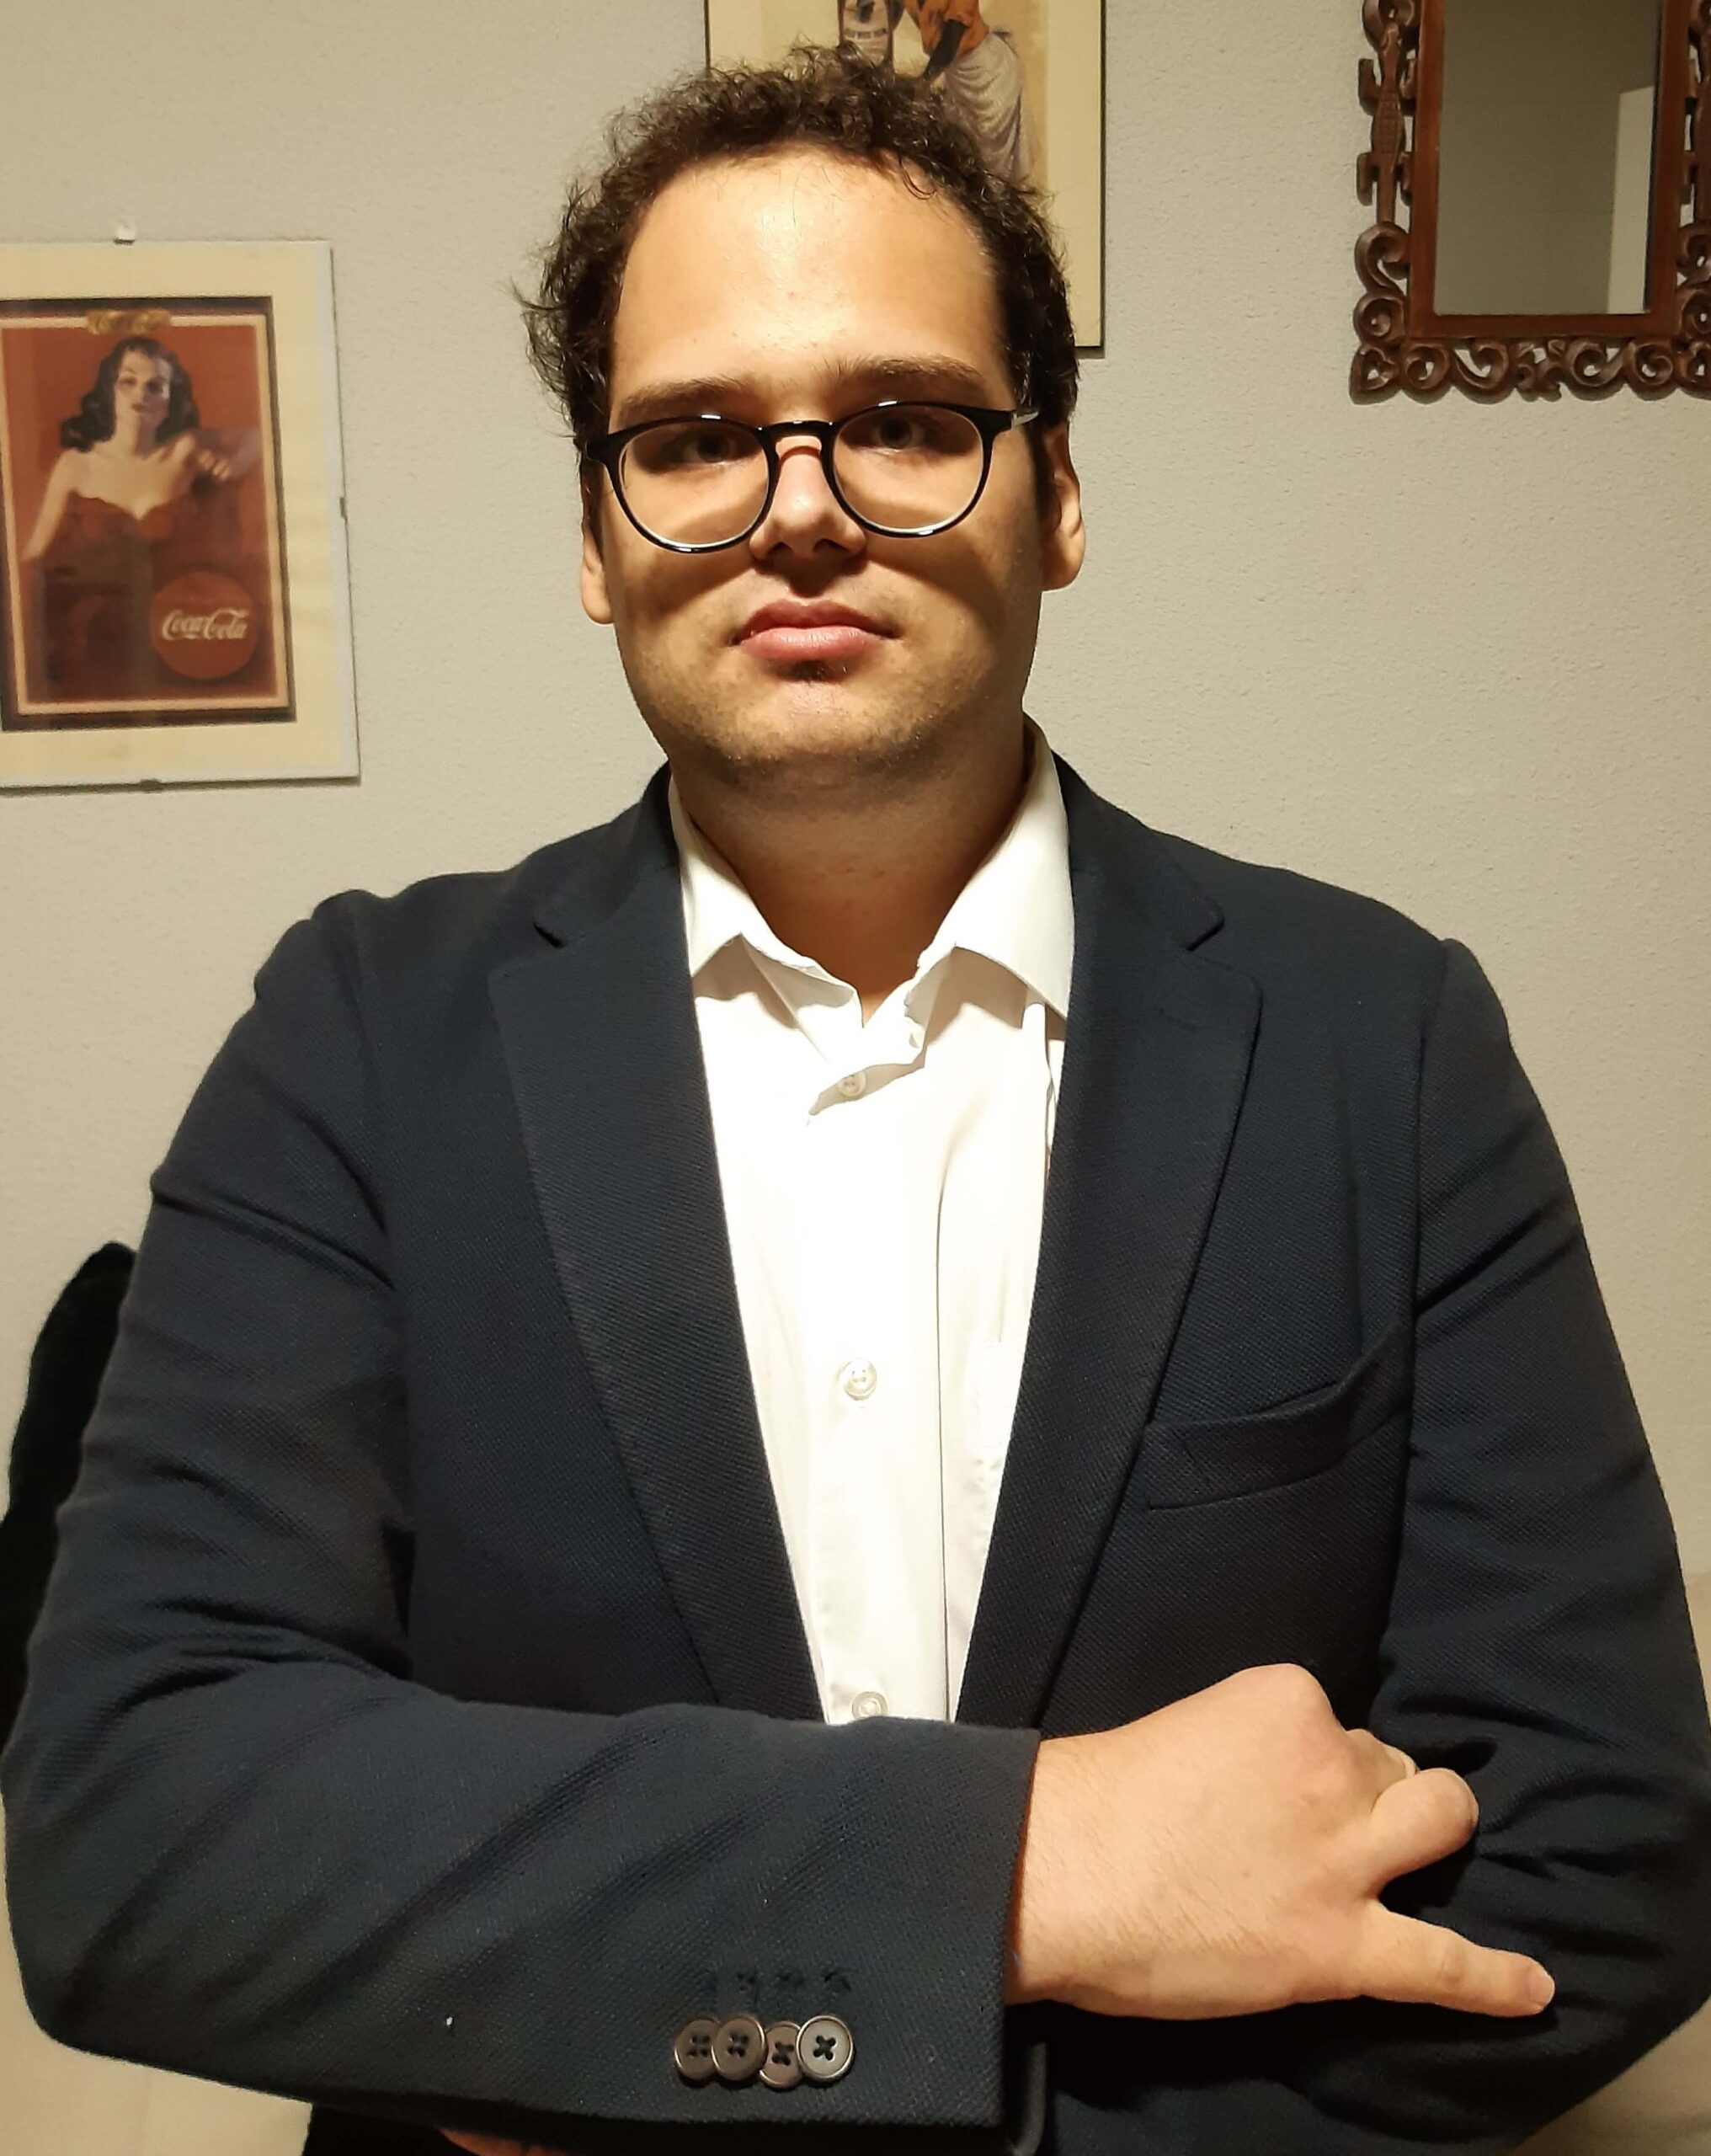 Fernando Cevallos Fresneda